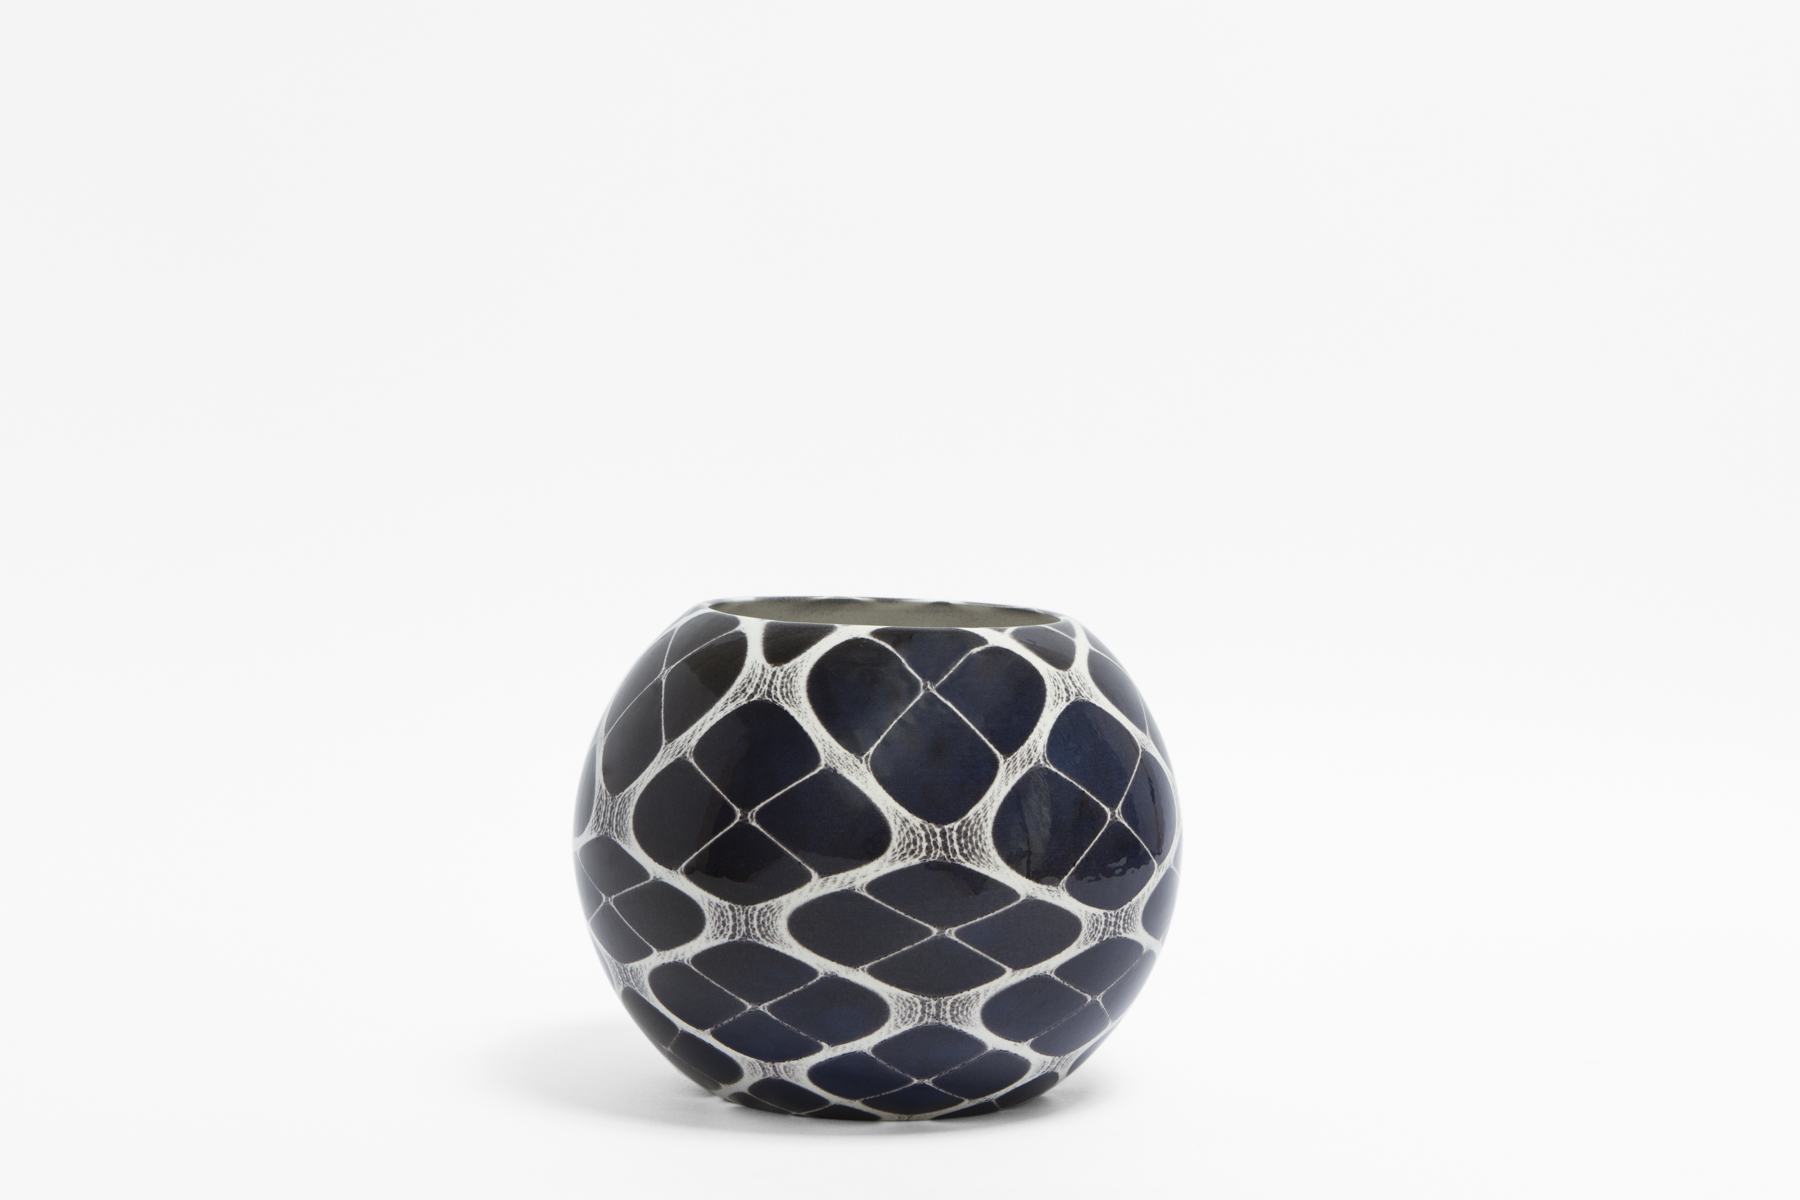 Vasi pattern by Ludek Lancellotti